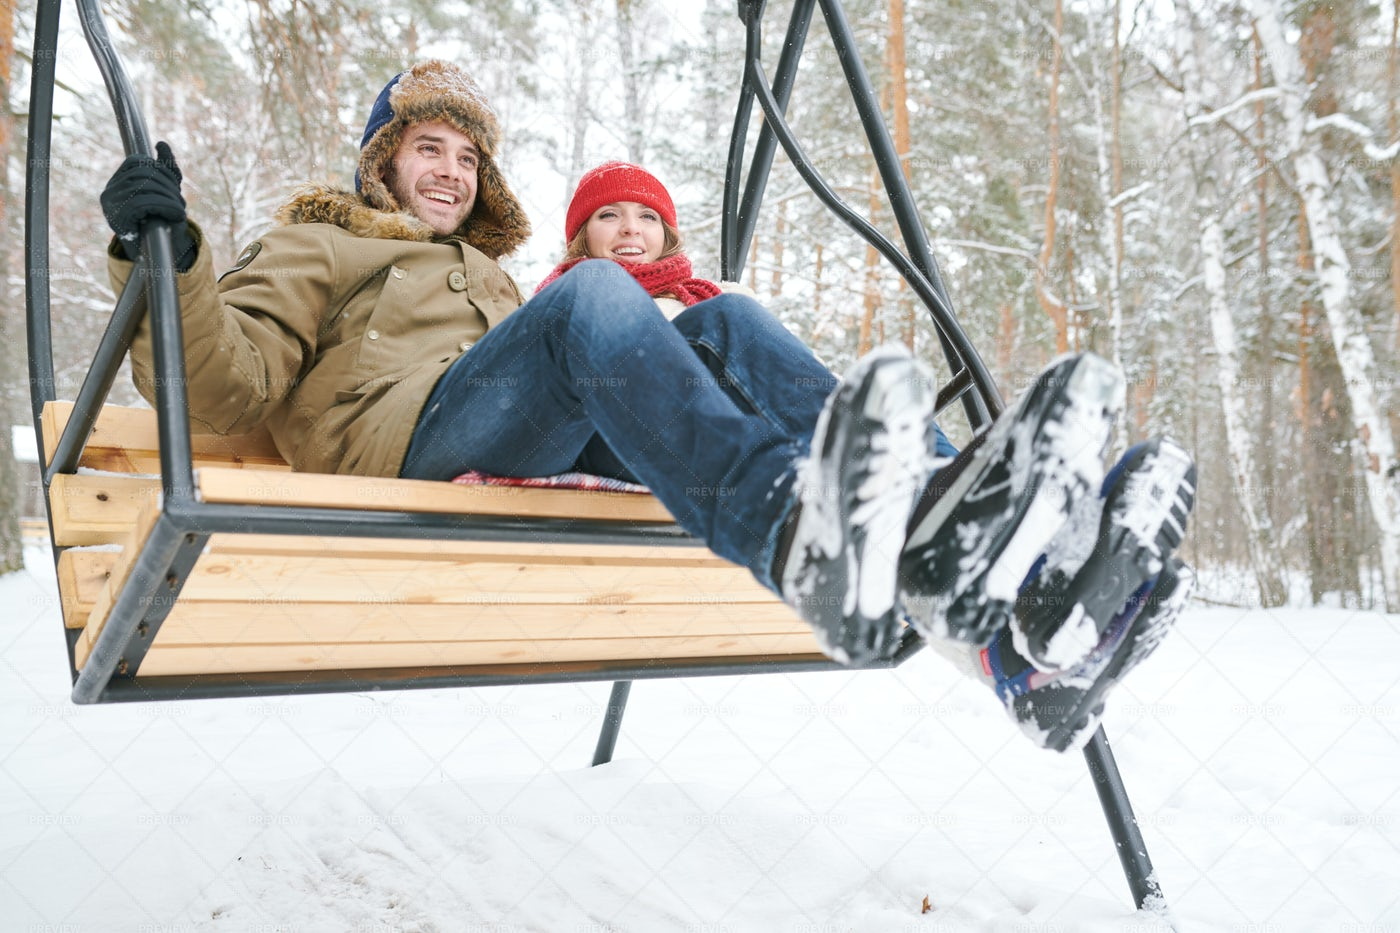 Couple On Wooden Swing: Stock Photos